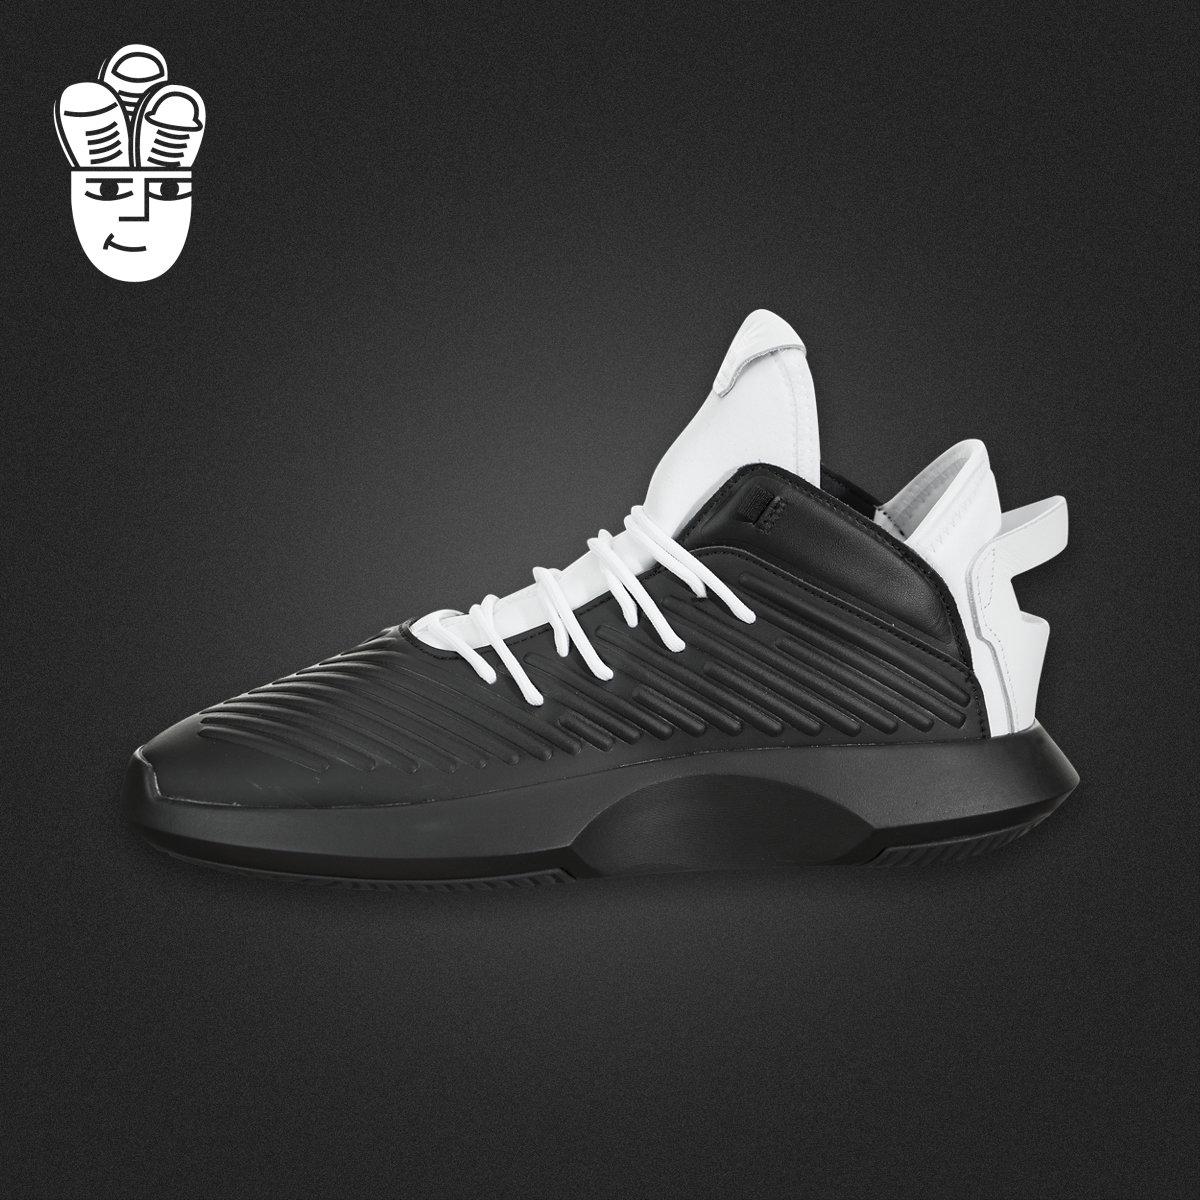 Adidas Crazy 1 ADV 阿迪达斯男鞋 篮球鞋潮流休闲鞋 运动鞋